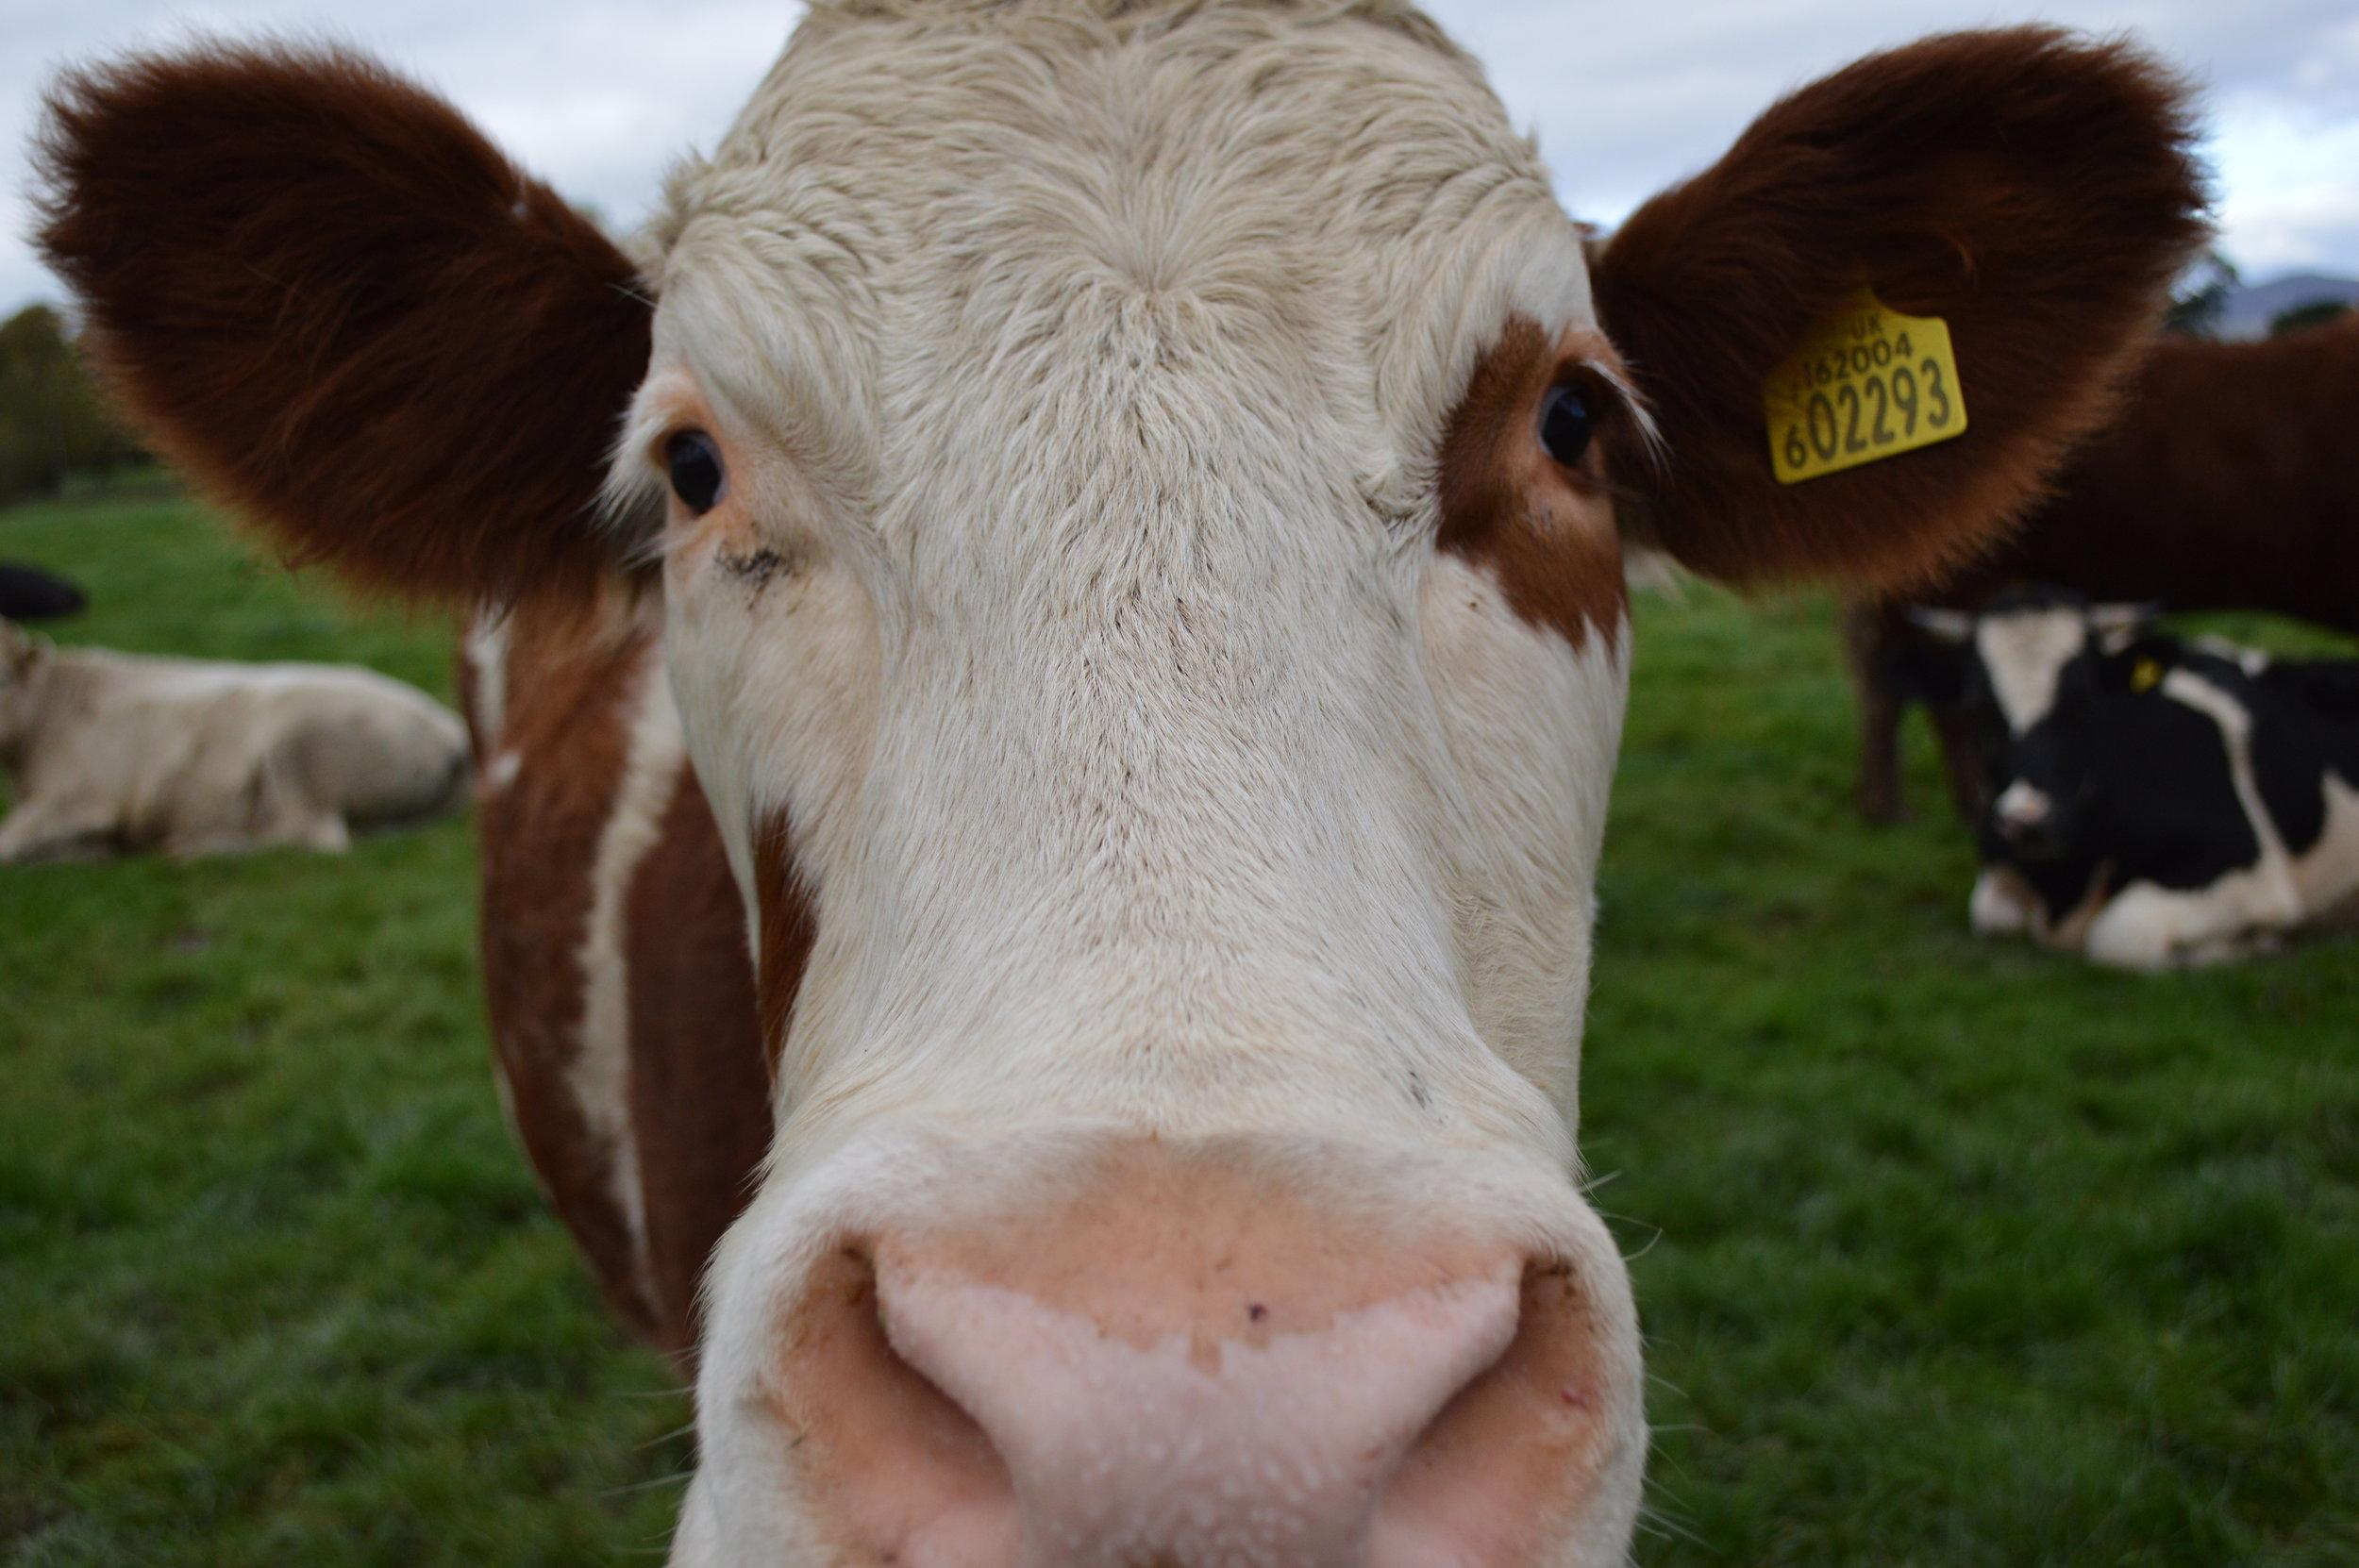 """Cow in Pasture"" by  debjam licensed under  CC 2.0"